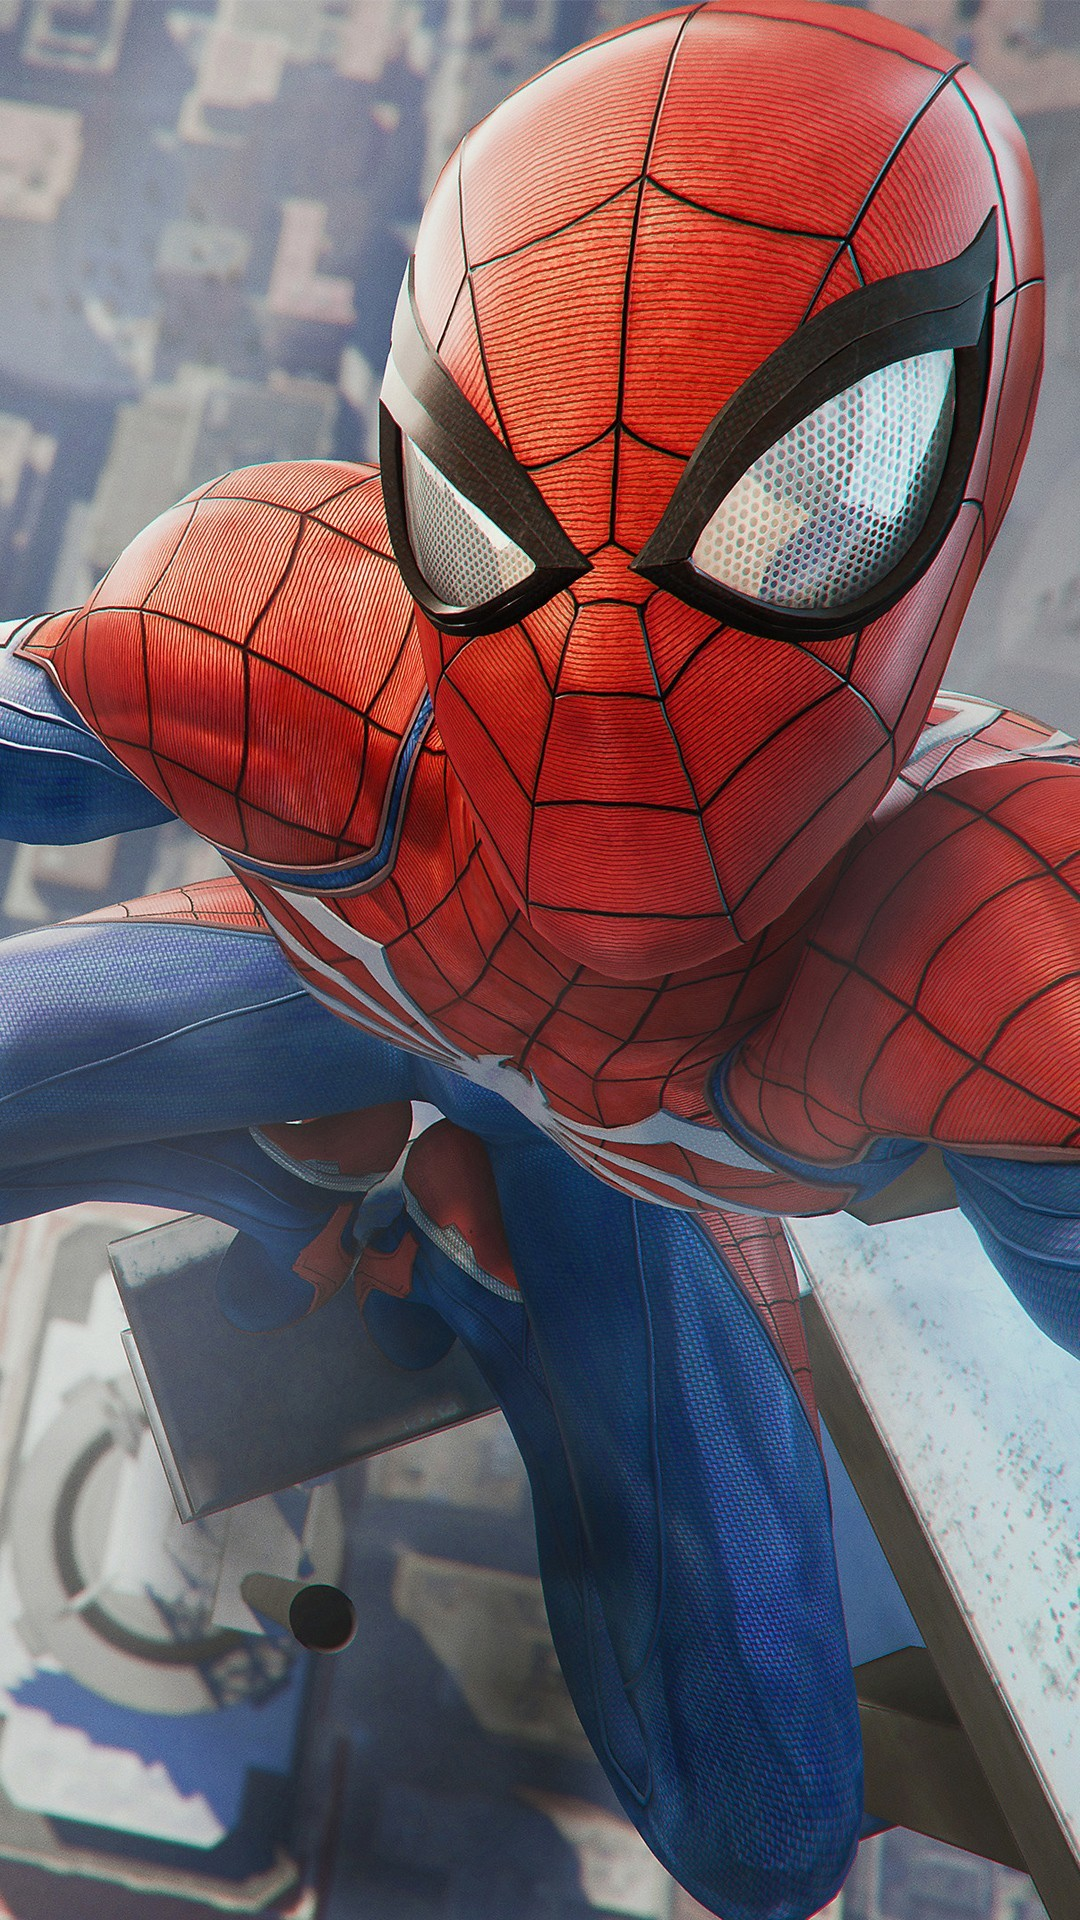 Free Spider Man Game phone wallpaper by tonyanc56